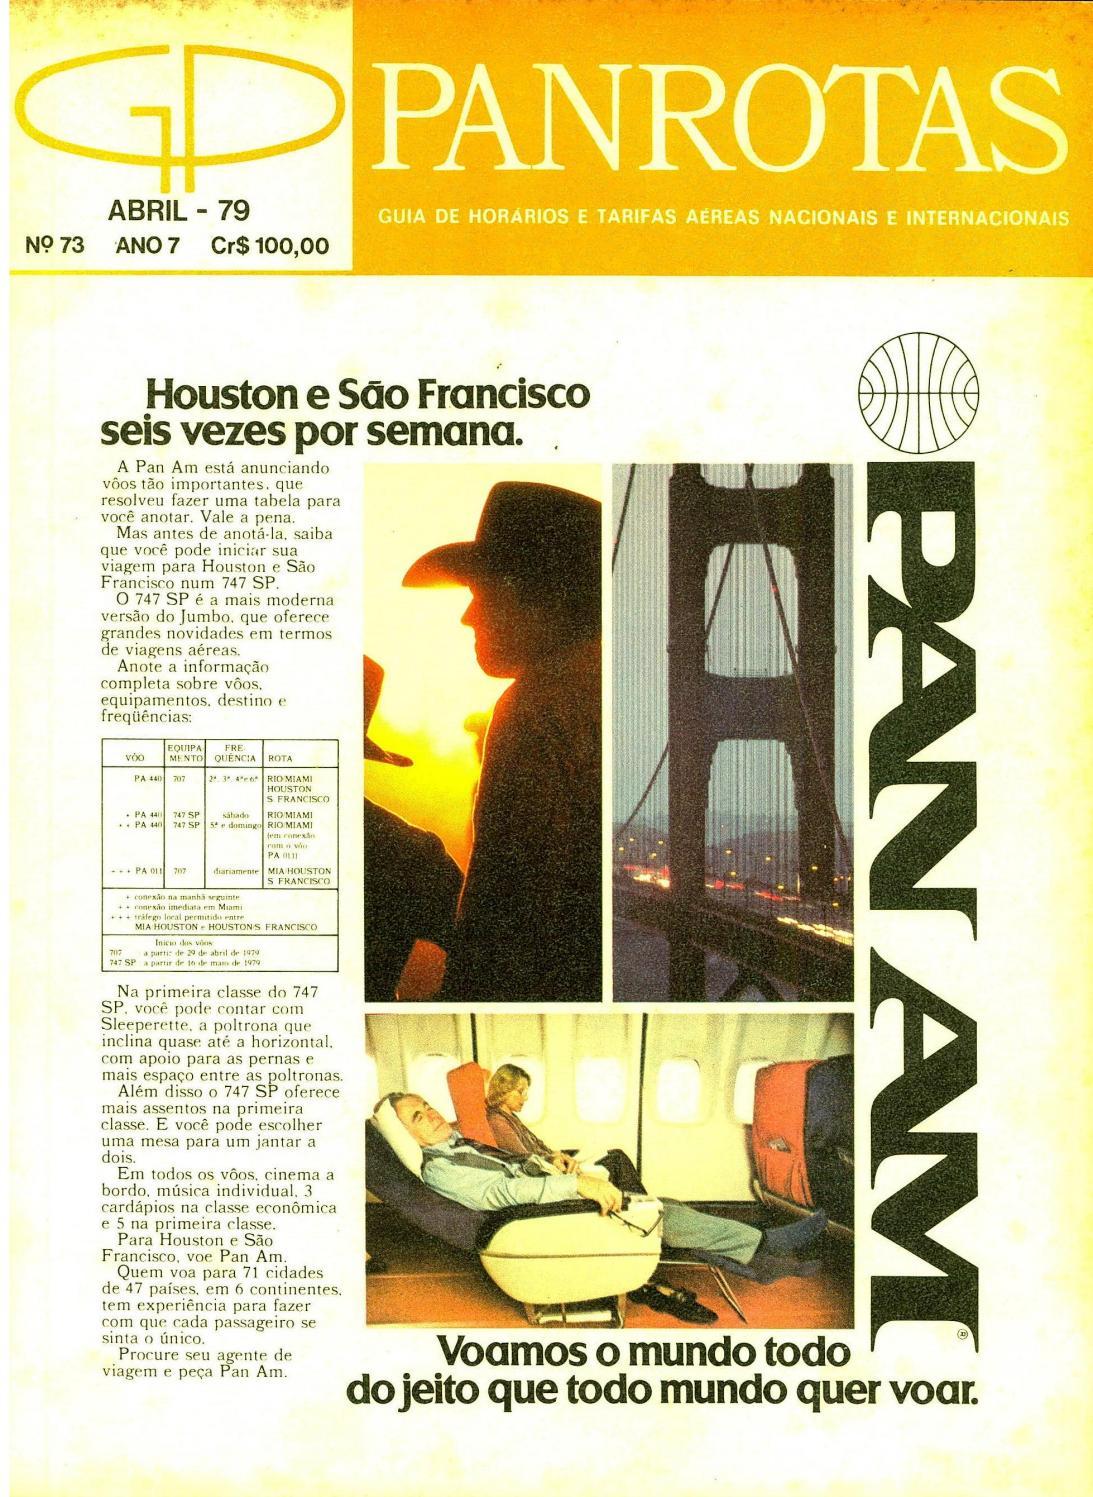 Hammock chair for sex